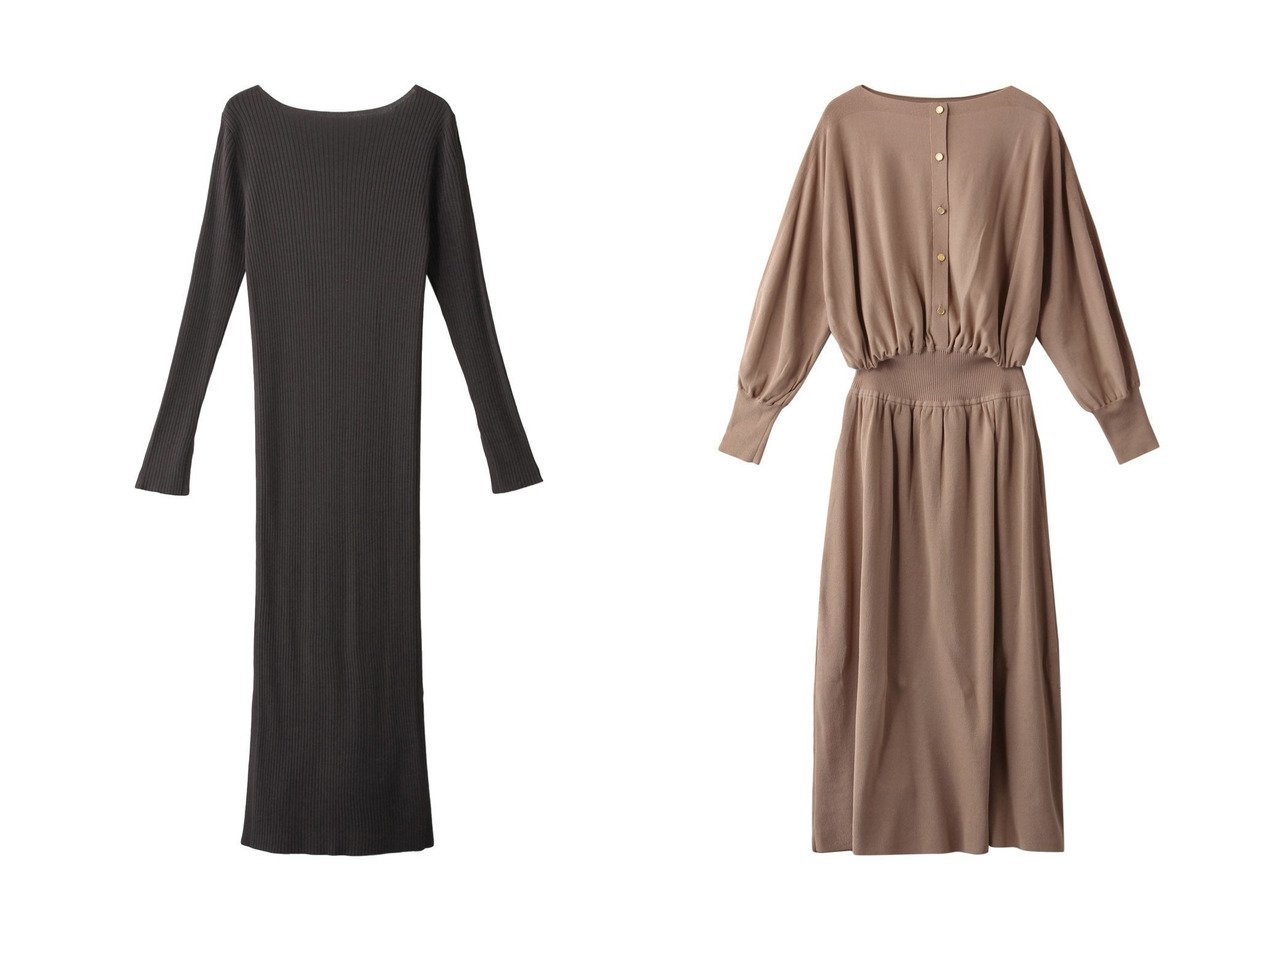 【Chaos/カオス】のCRシルクコンリブニットワンピース&【martinique/マルティニーク】のリブ切替ニットワンピース 【ワンピース・ドレス】おすすめ!人気、トレンド・レディースファッションの通販  おすすめで人気の流行・トレンド、ファッションの通販商品 メンズファッション・キッズファッション・インテリア・家具・レディースファッション・服の通販 founy(ファニー) https://founy.com/ ファッション Fashion レディースファッション WOMEN ワンピース Dress ニットワンピース Knit Dresses 2021年 2021 2021春夏・S/S SS/Spring/Summer/2021 S/S・春夏 SS・Spring/Summer シンプル スリット フィット 春 Spring |ID:crp329100000027086